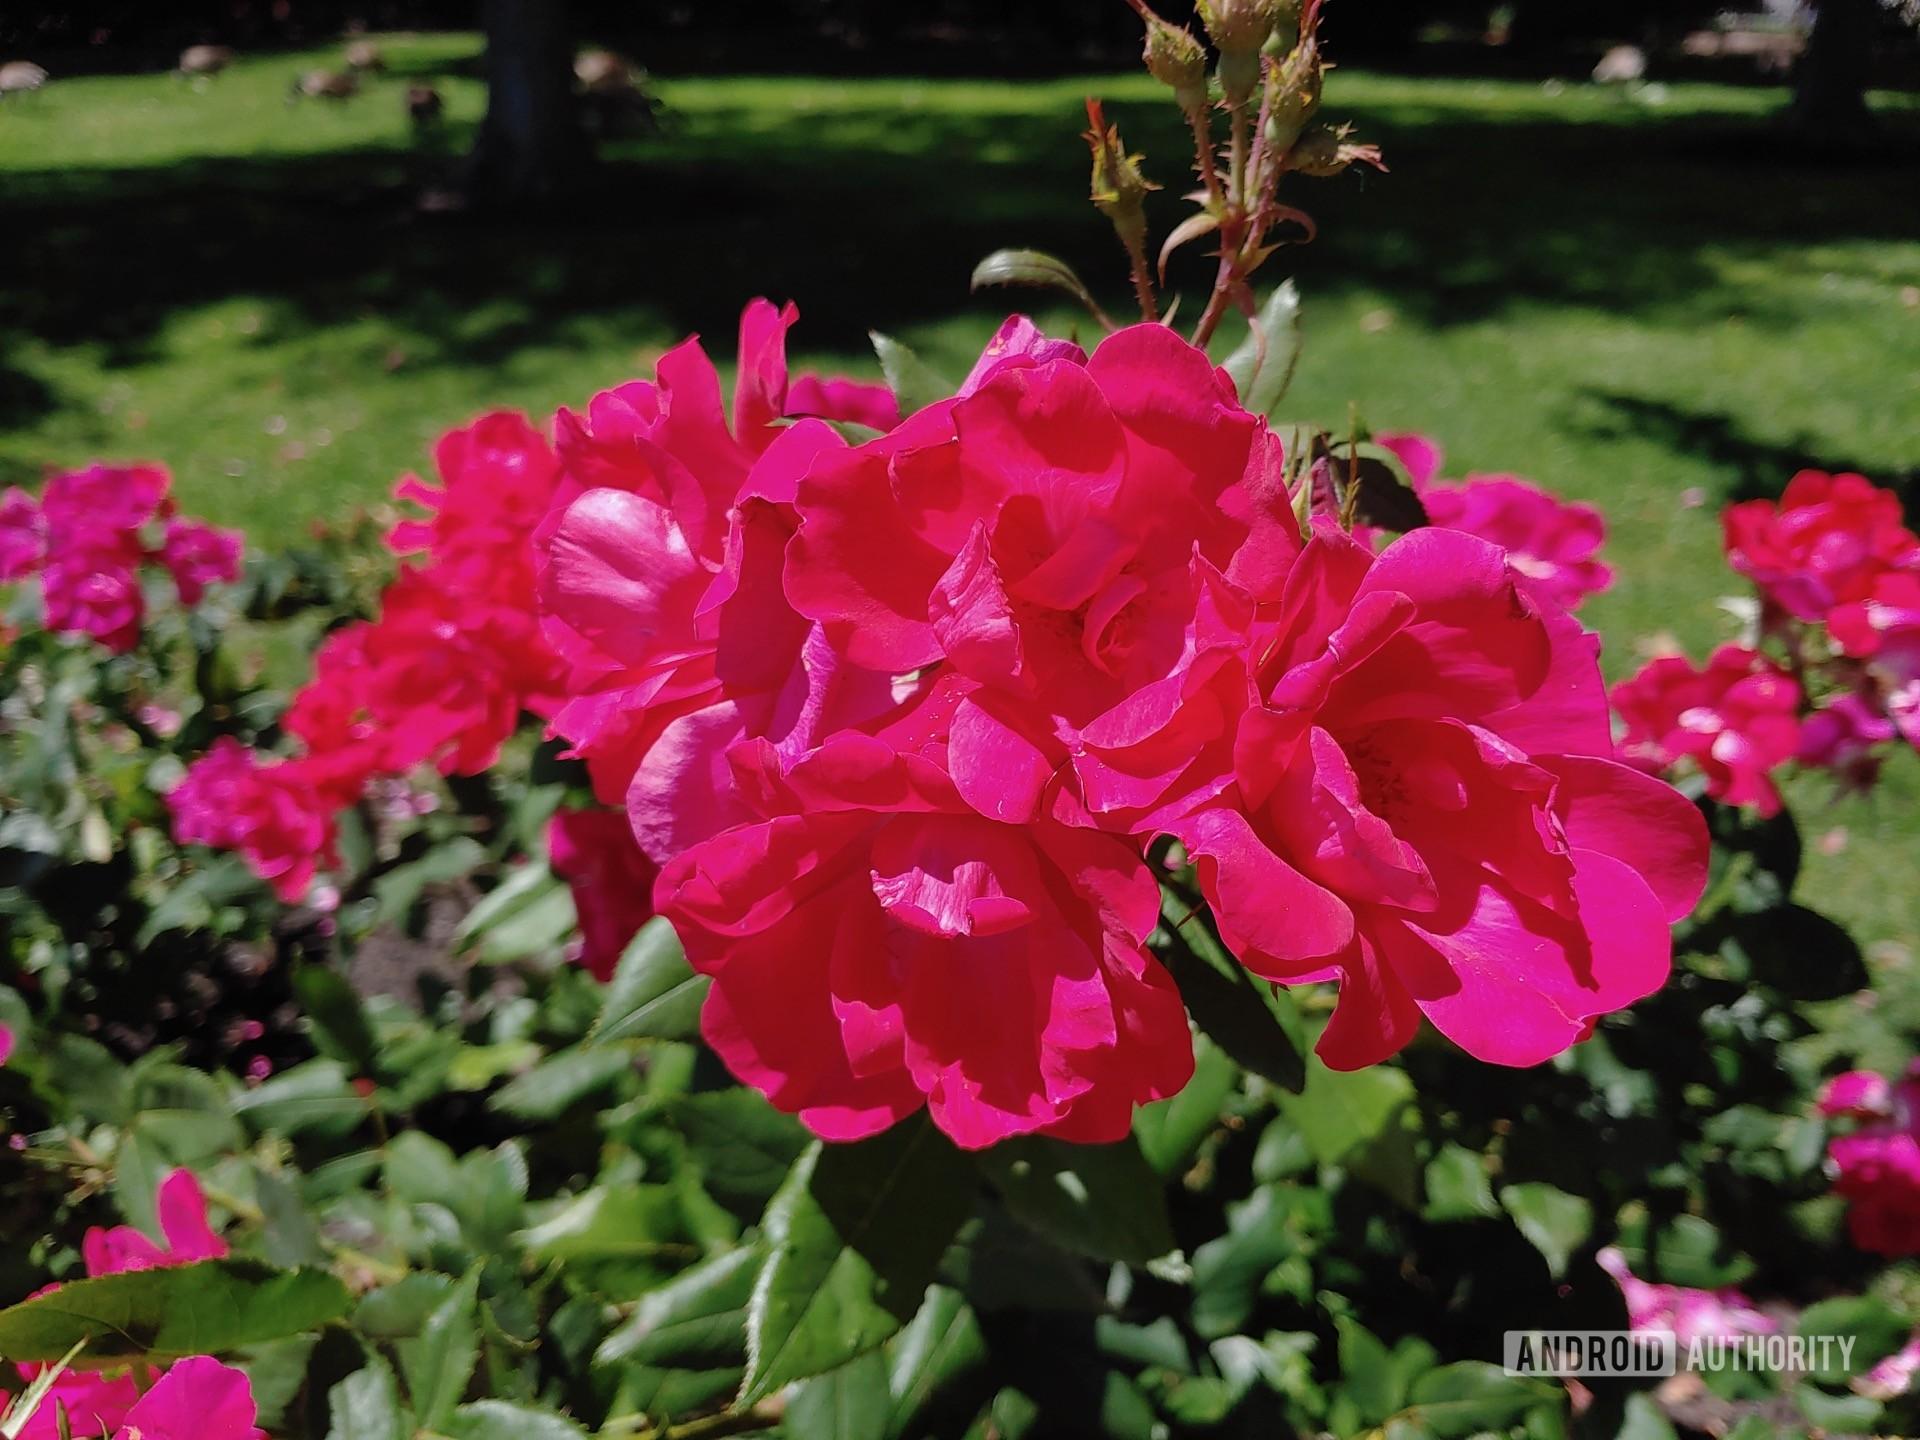 LG V50 ThinQ Review sample photo flower closeup